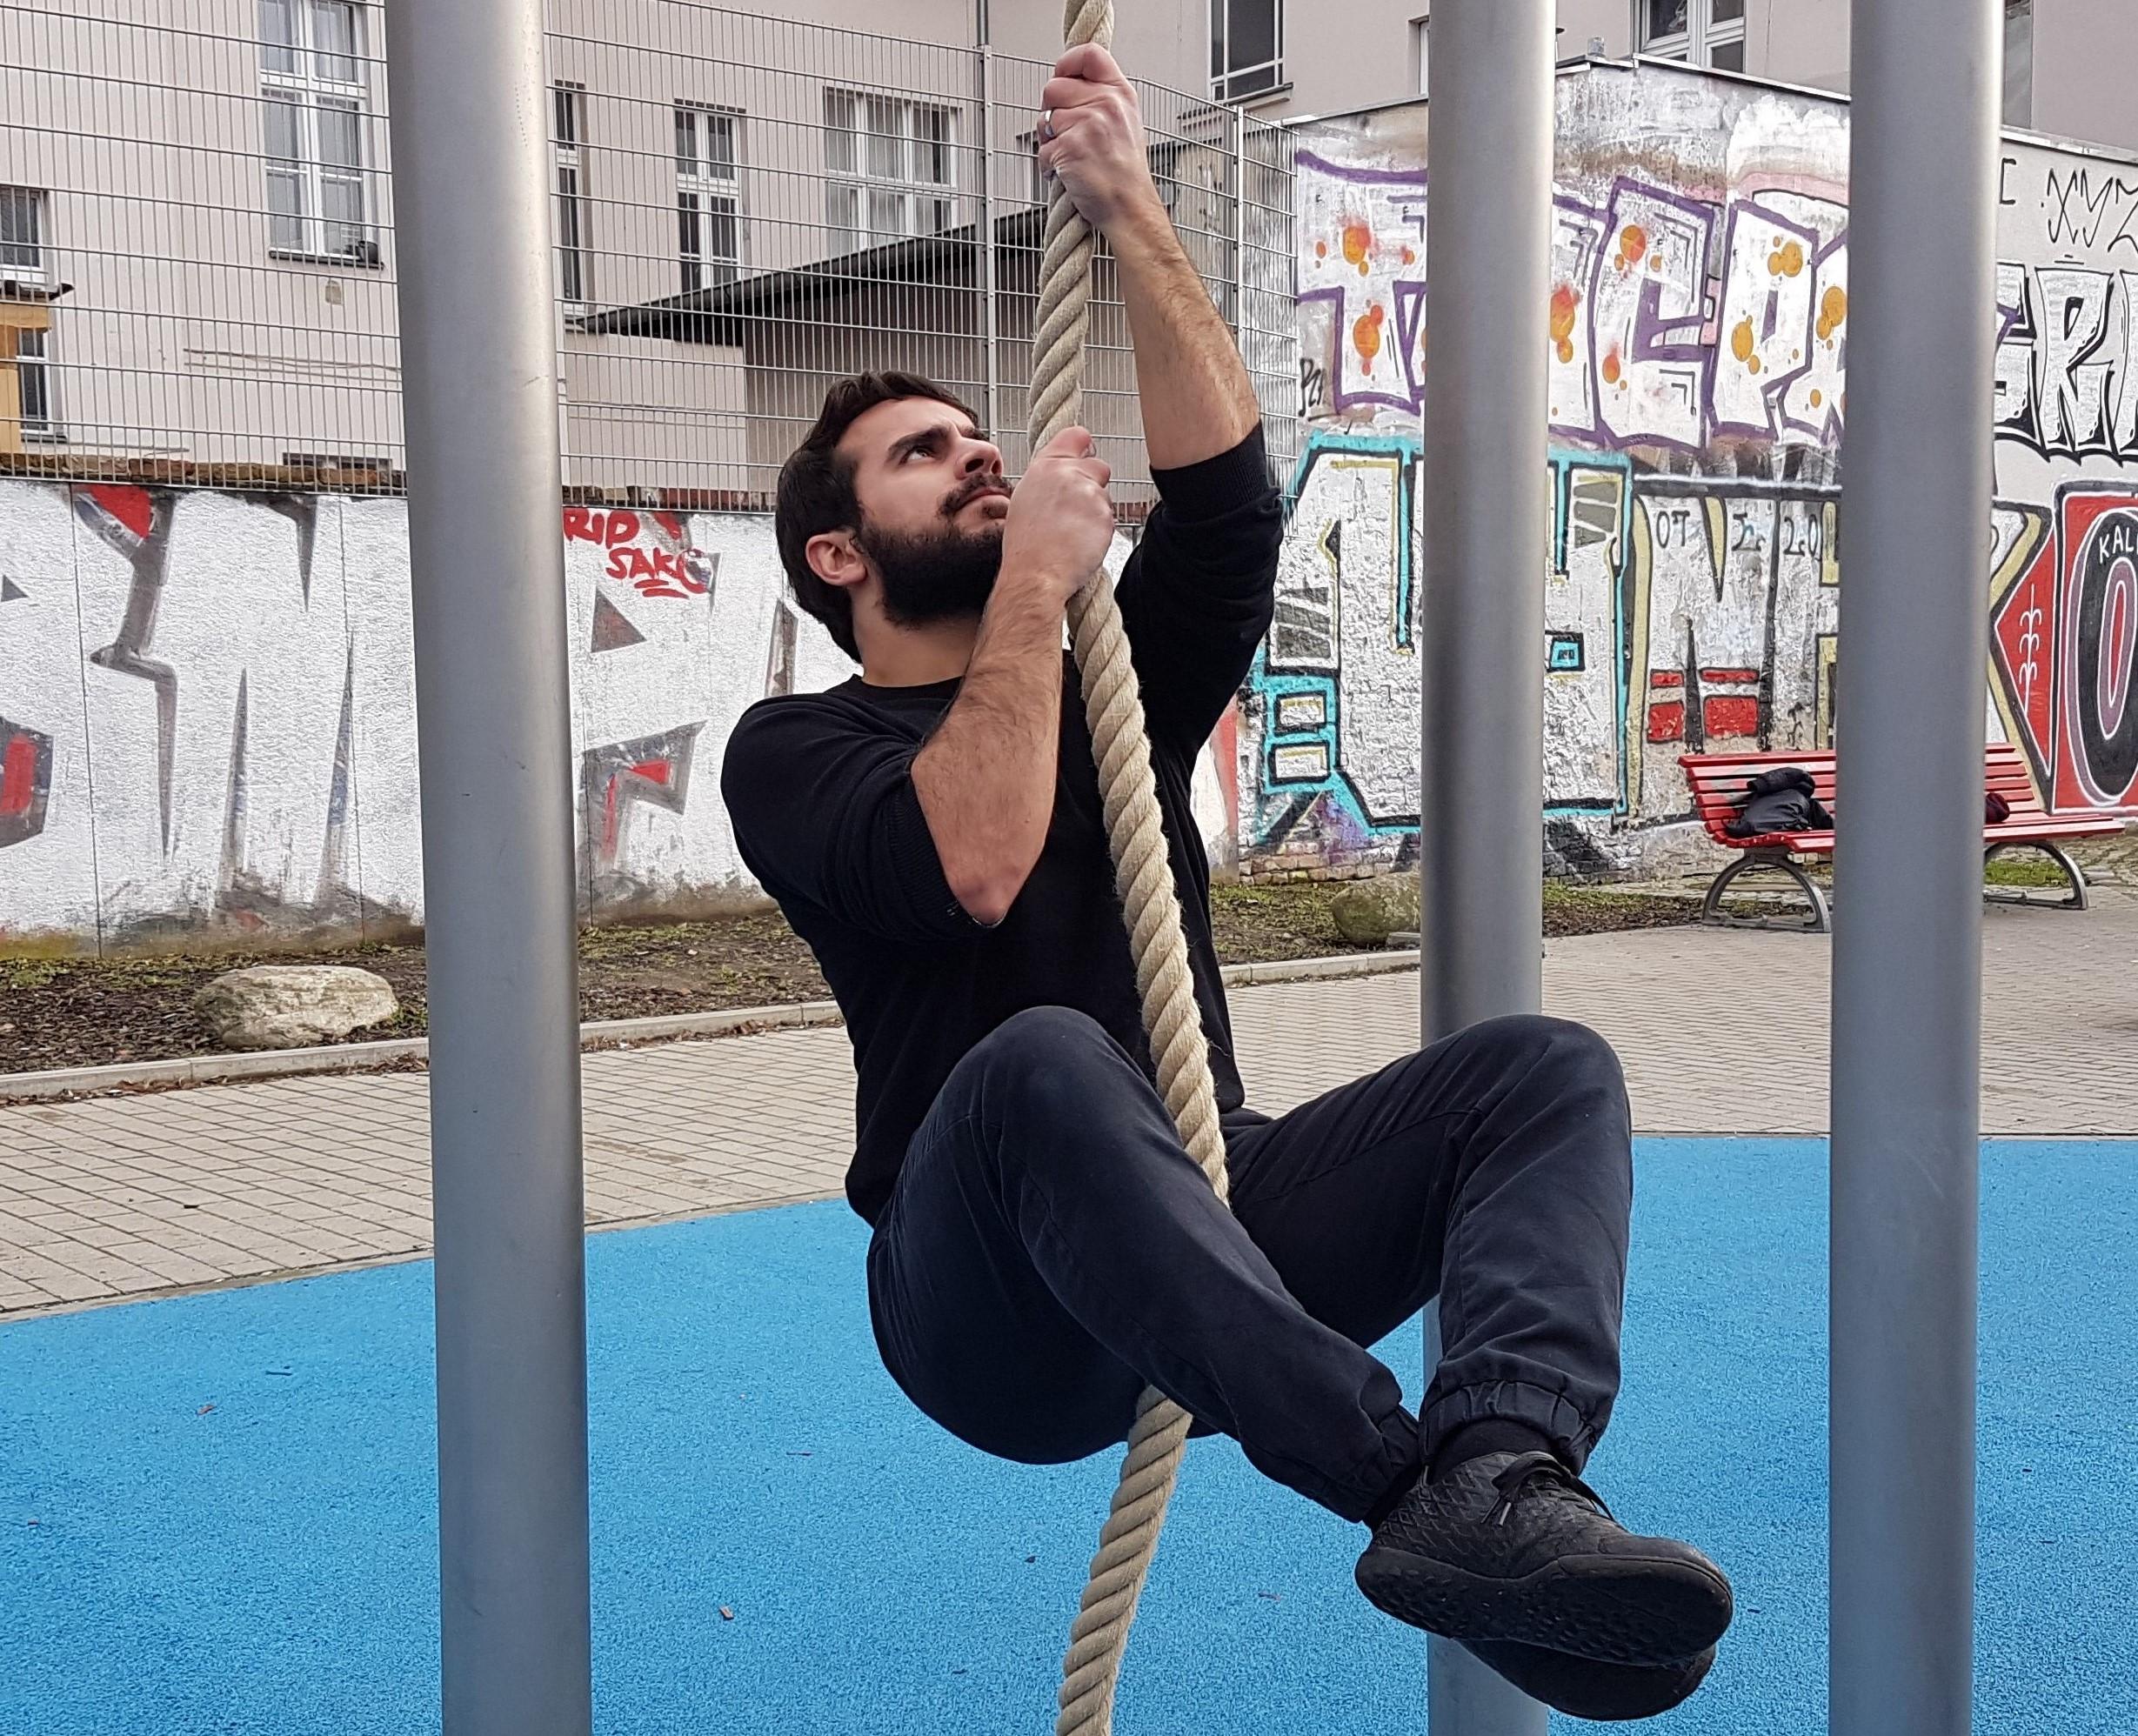 Trainer Cihad   Dein Personal Trainer Berlin